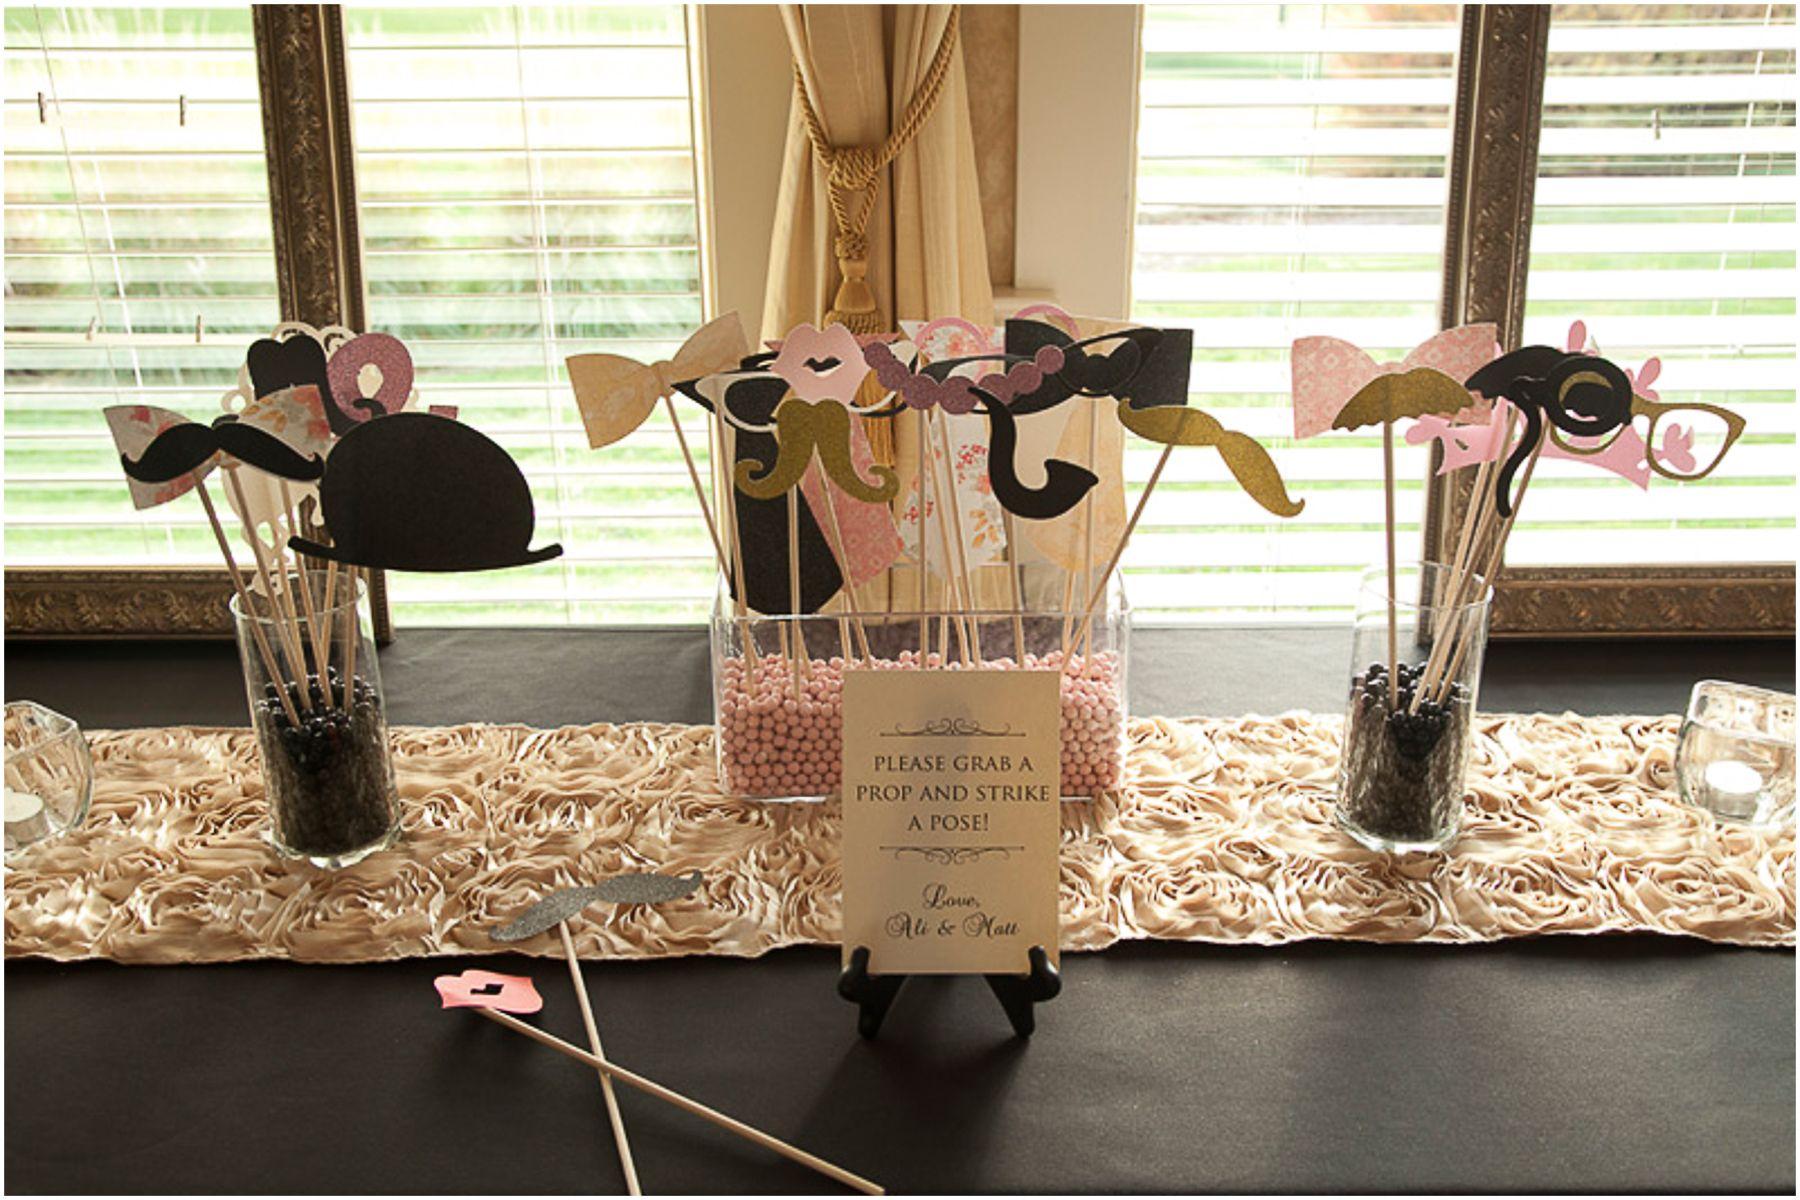 wedding photo booth props printable%0A Wedding Photography Blushing Wedding Photo Booth Nj Lovable Wedding Photo  Booth Make A Wedding Photo Booth